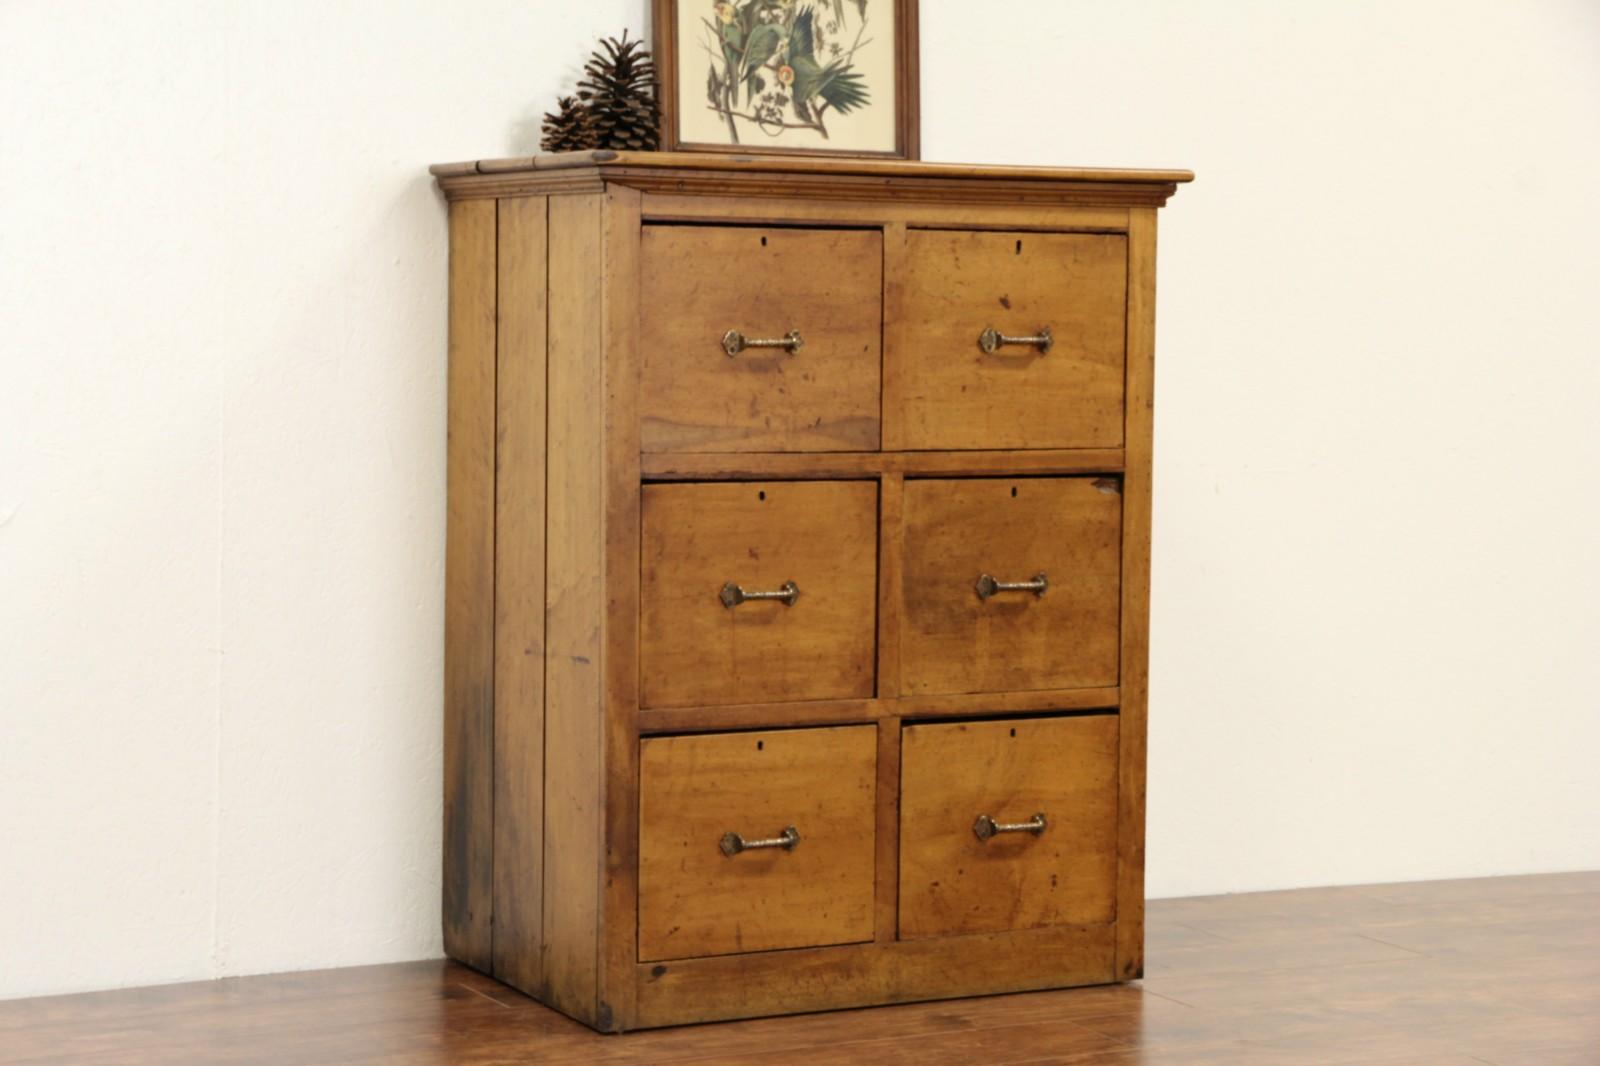 Primitive Maple 1890 Antique 6 Drawer Chest File Cabinet Bronze Pulls